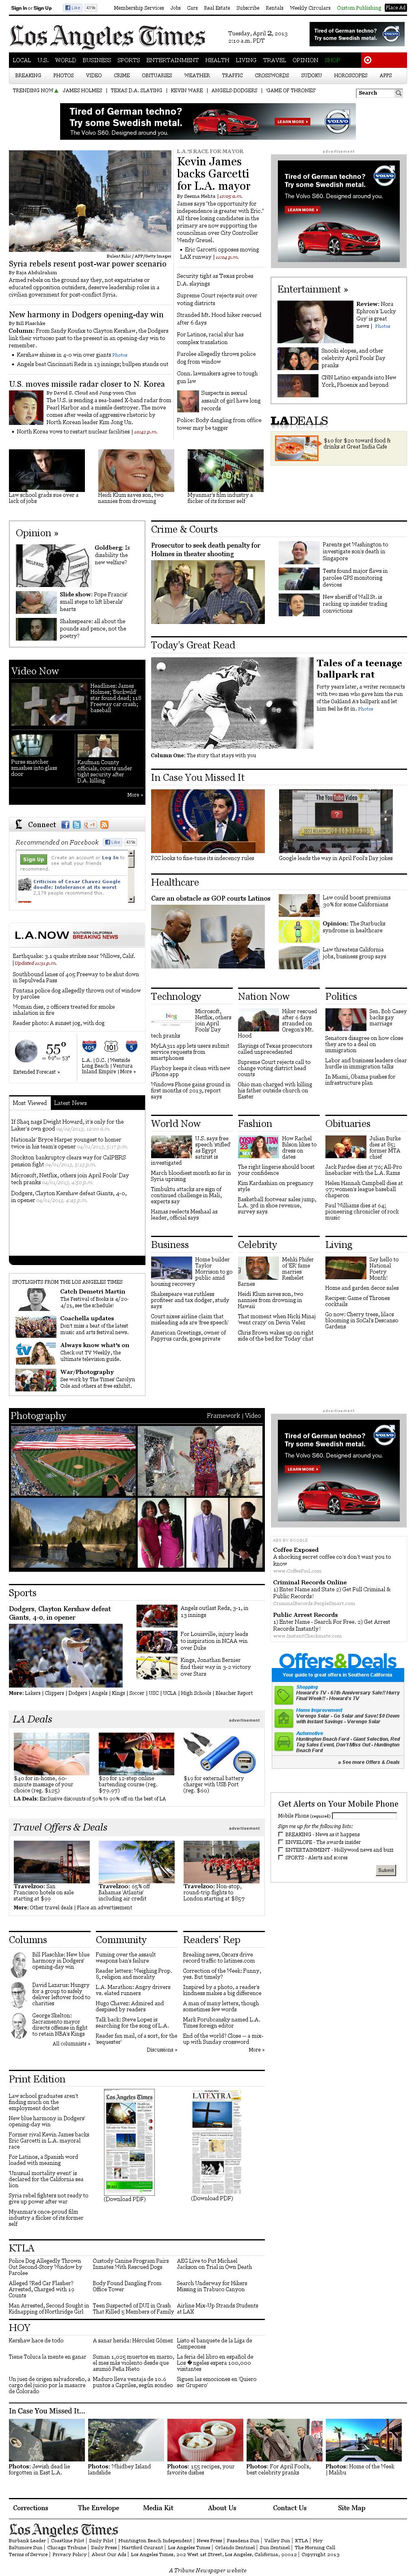 Los Angeles Times at Tuesday April 2, 2013, 9:11 a.m. UTC